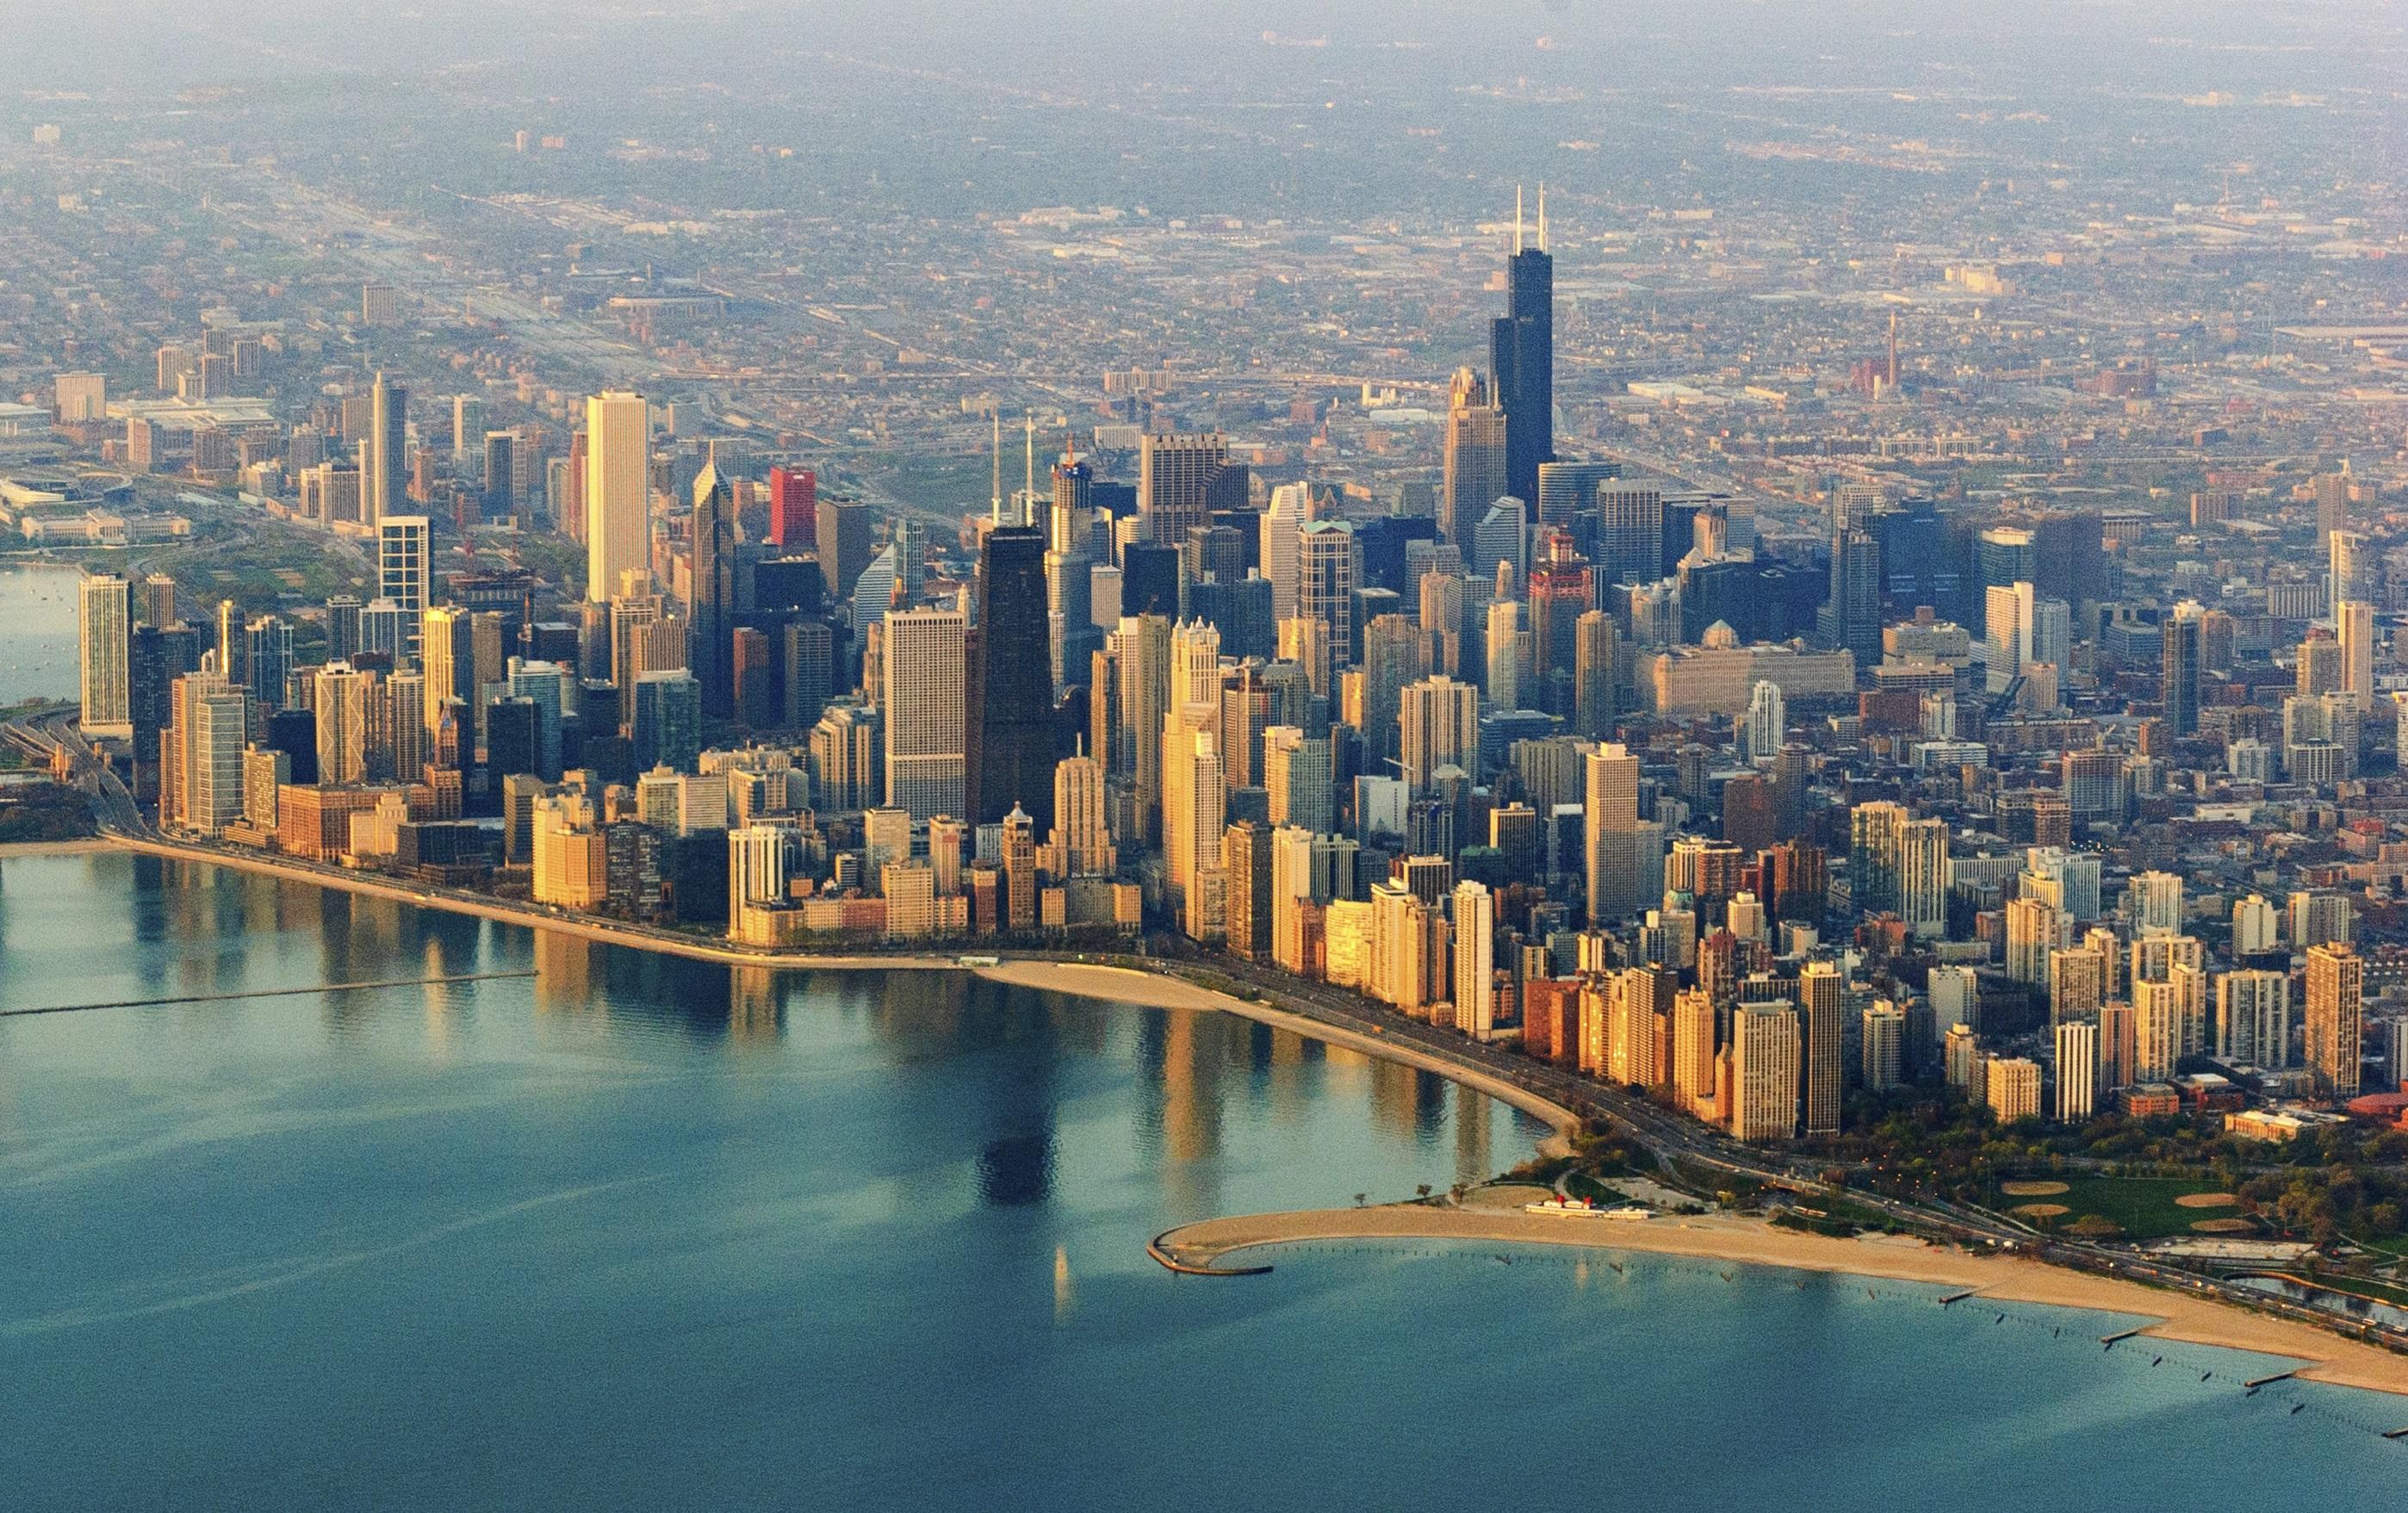 Canceled - 2020 Socrates Chicago Salon